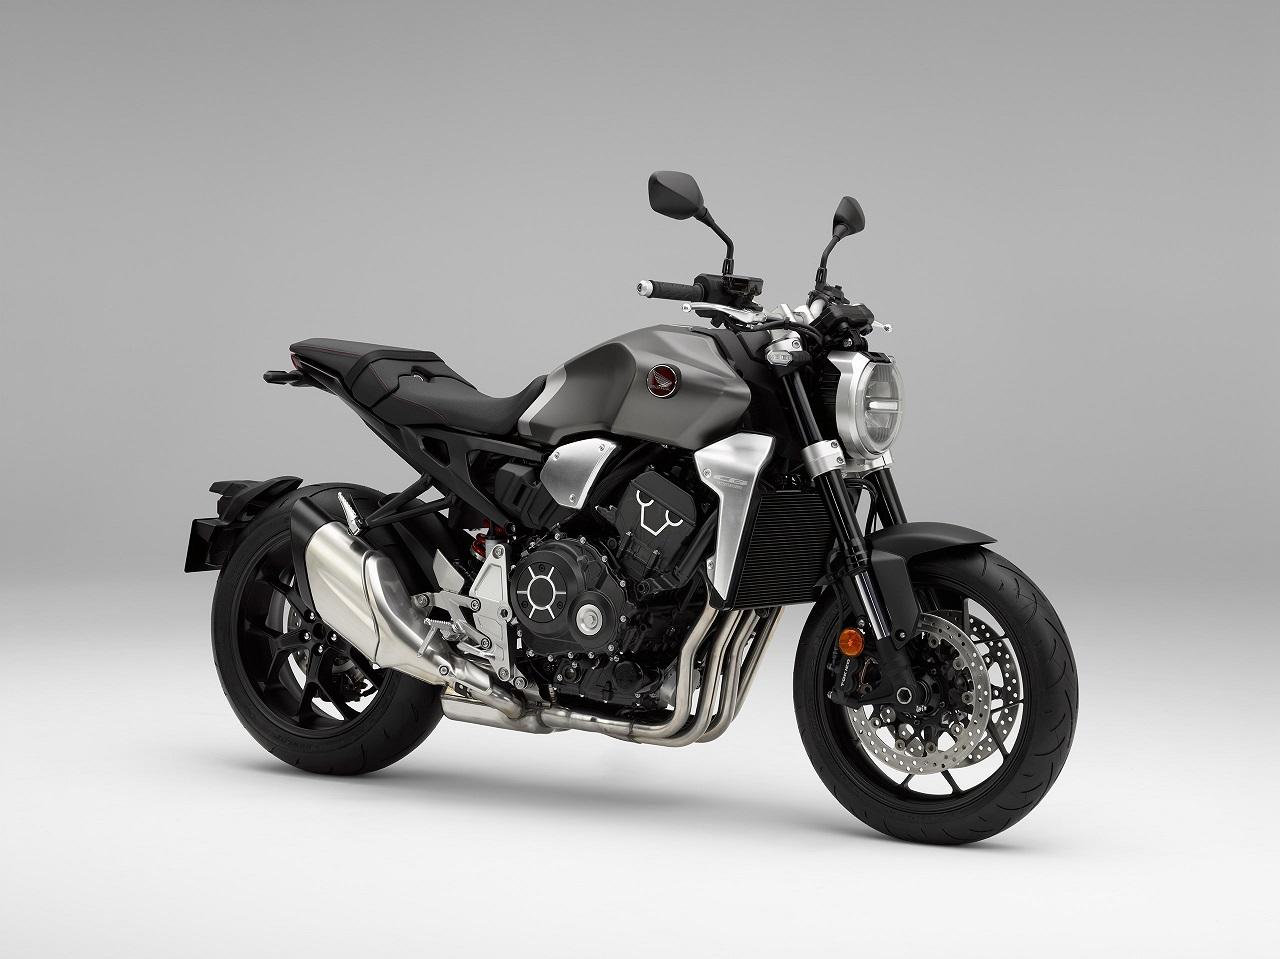 Honda-che-hang-doc-nakedbike-650-phan-khoi-anh-2